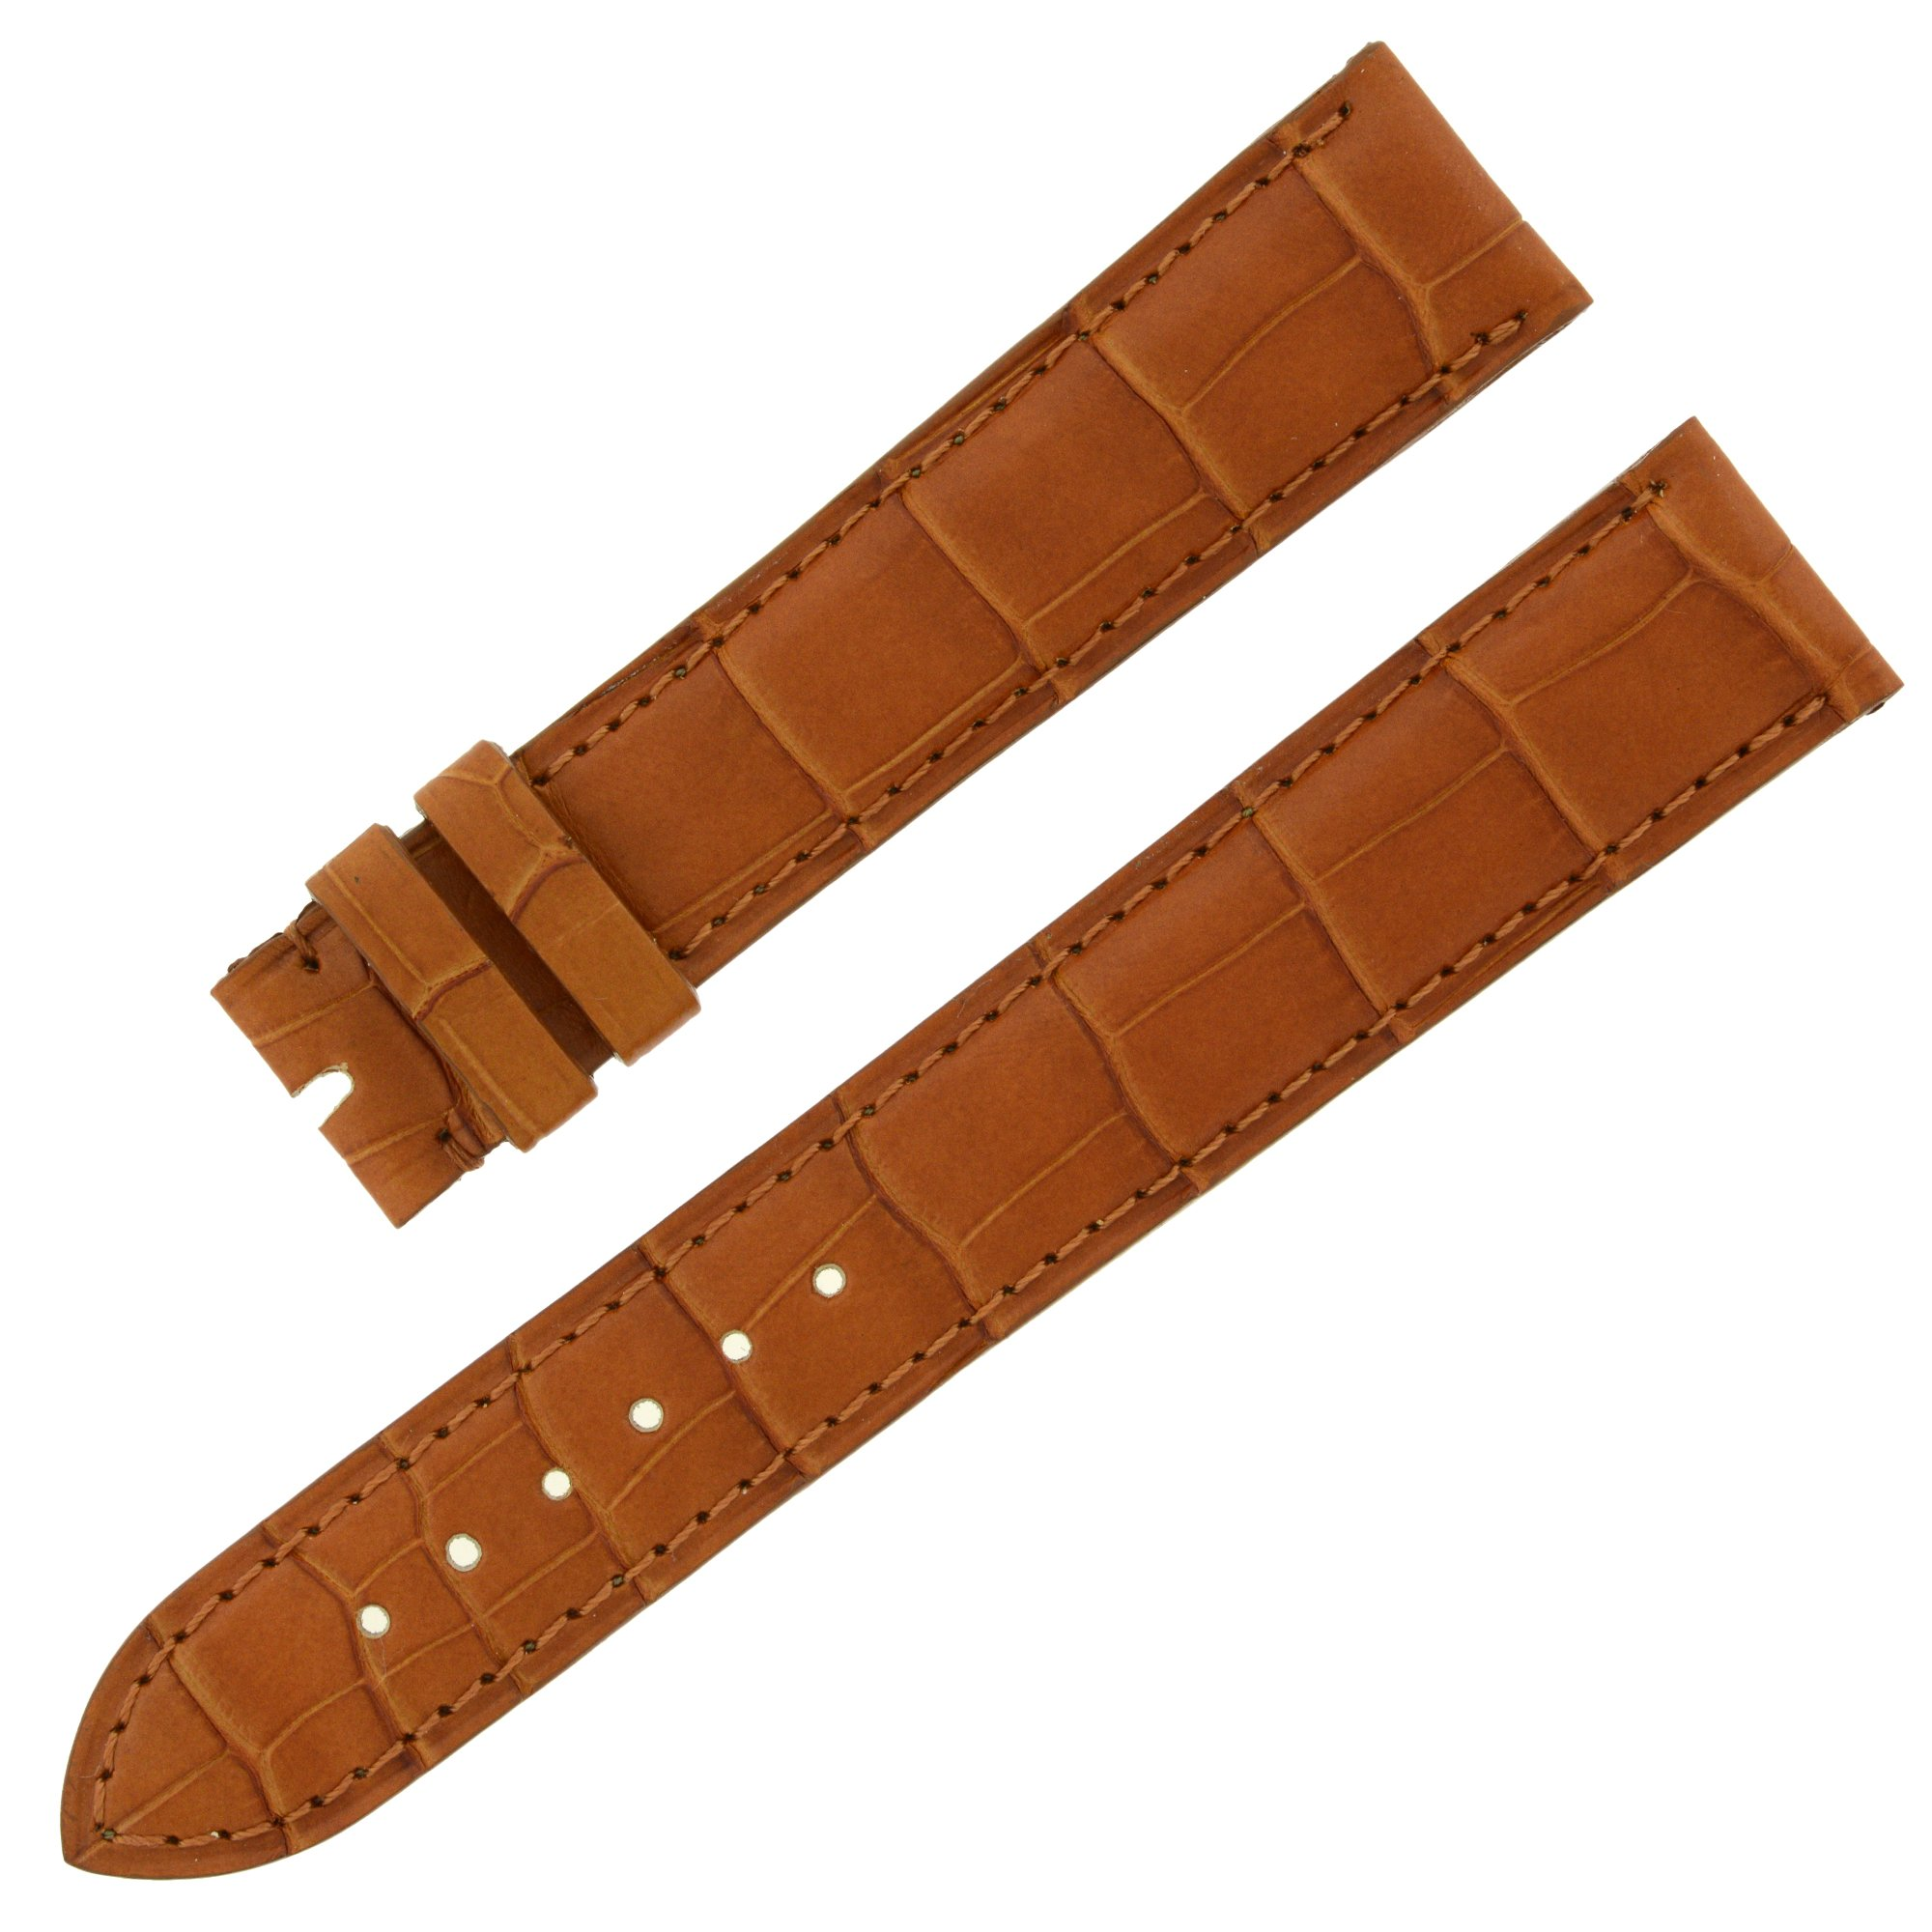 Chopard 18-16 mm Saddle Genuine Alligator Leather Women's Watch Band